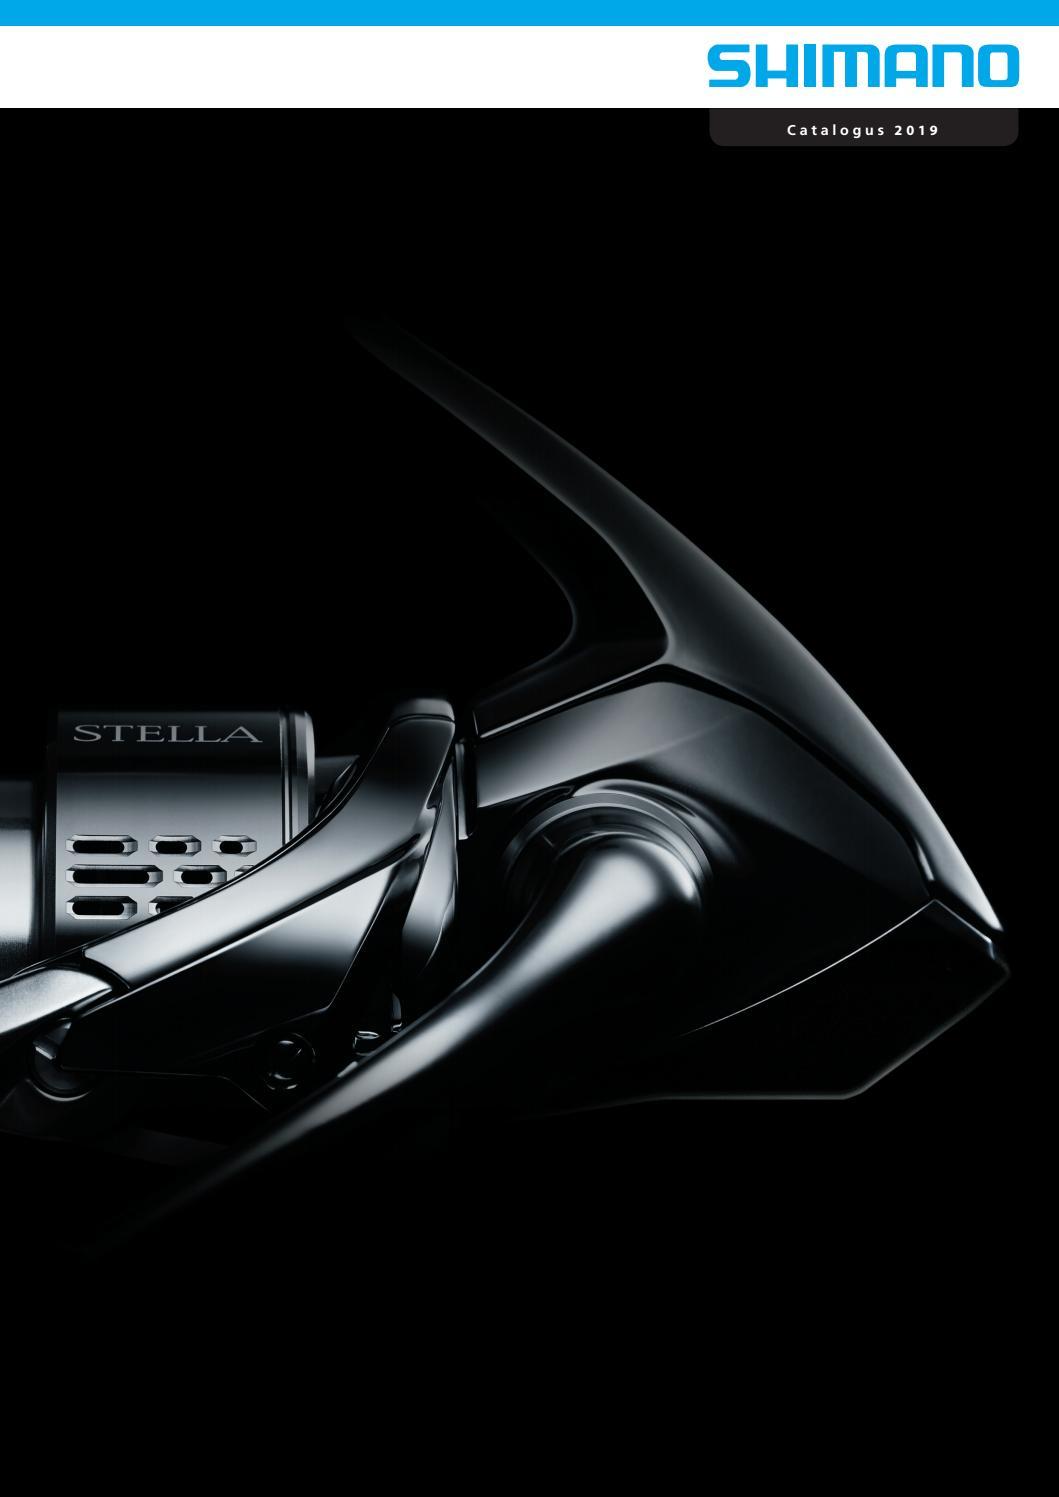 2500HG FB 2500 HG fit C3000 FB New SHIMANO GENUINE REEL HANDLE for STRADIC CI4